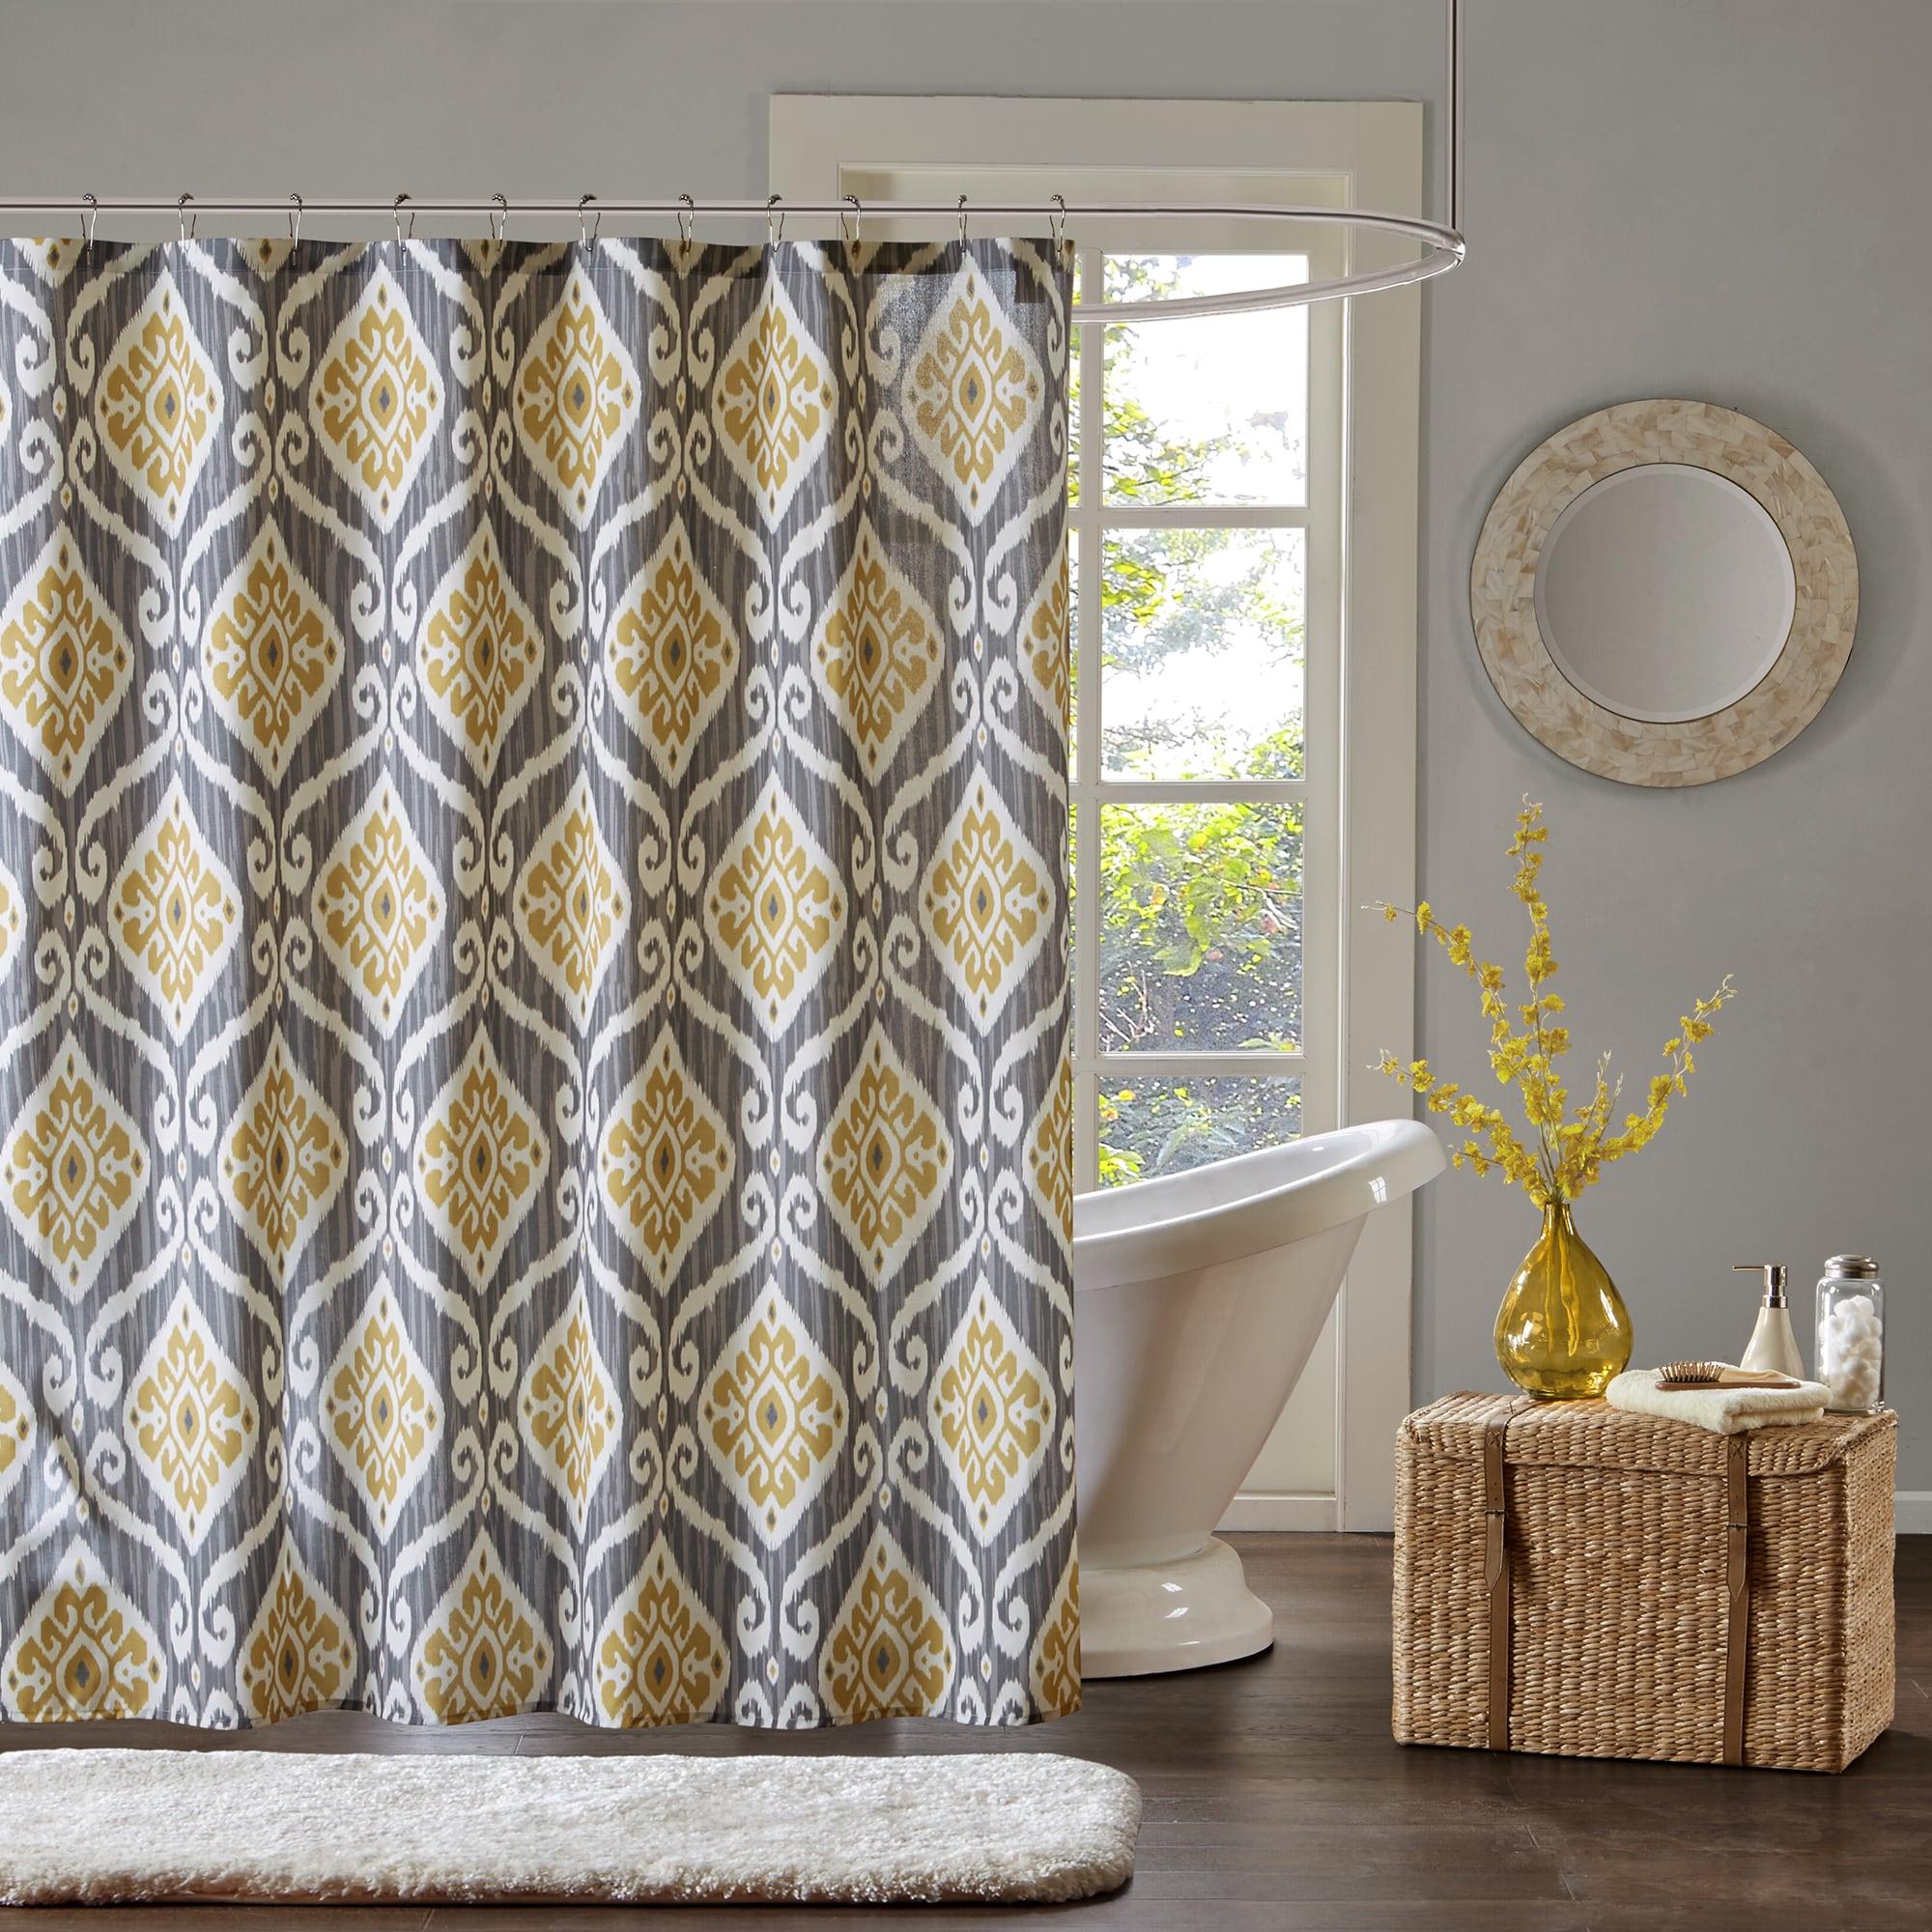 stripe cfm summerpalmstripeshowercurtain shower master striped hayneedle summer palm product yellow curtain